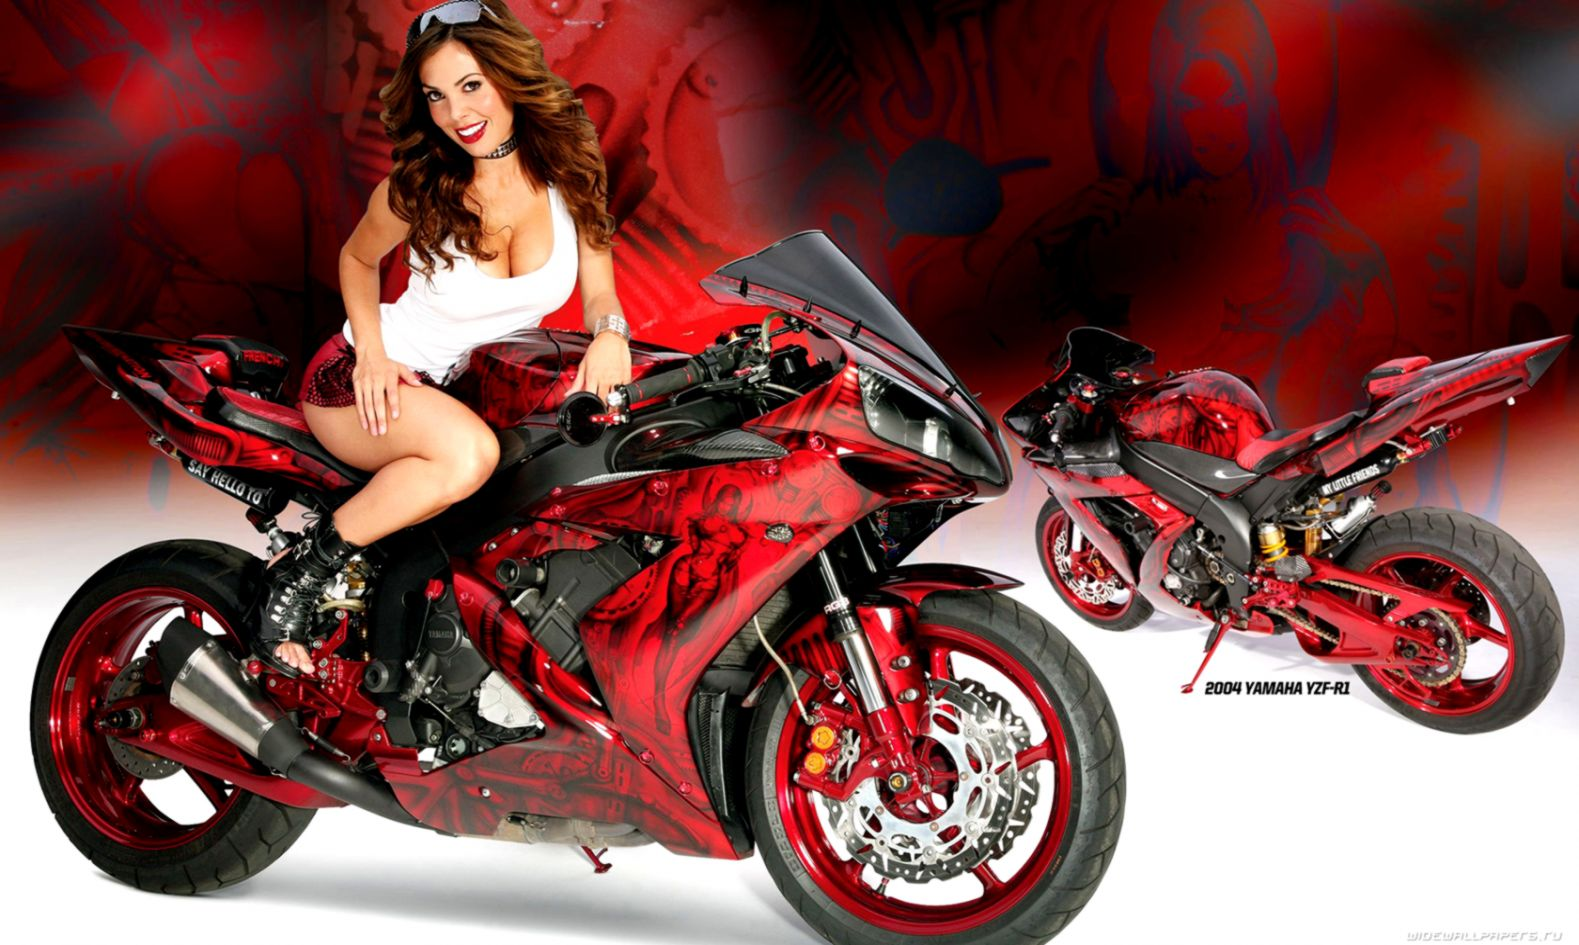 Yamaha R1 Bikes Girls Motorcycle Wallpaper Room Wallpapers